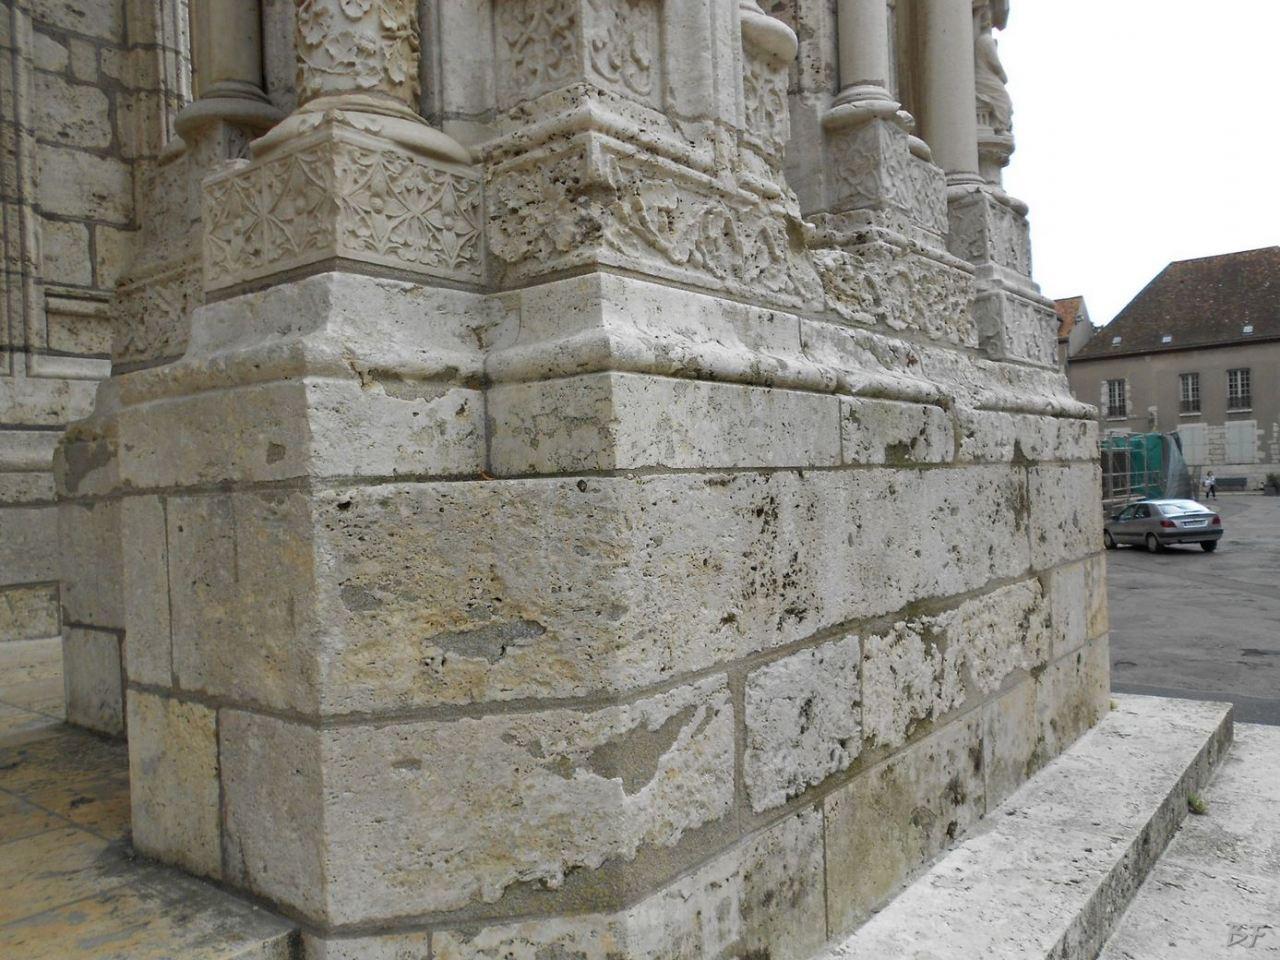 Cattedrale-Gotica-della-Vergine-Chartres-Eure-et-Loir-Centre-Val-de-Loire-Francia-3